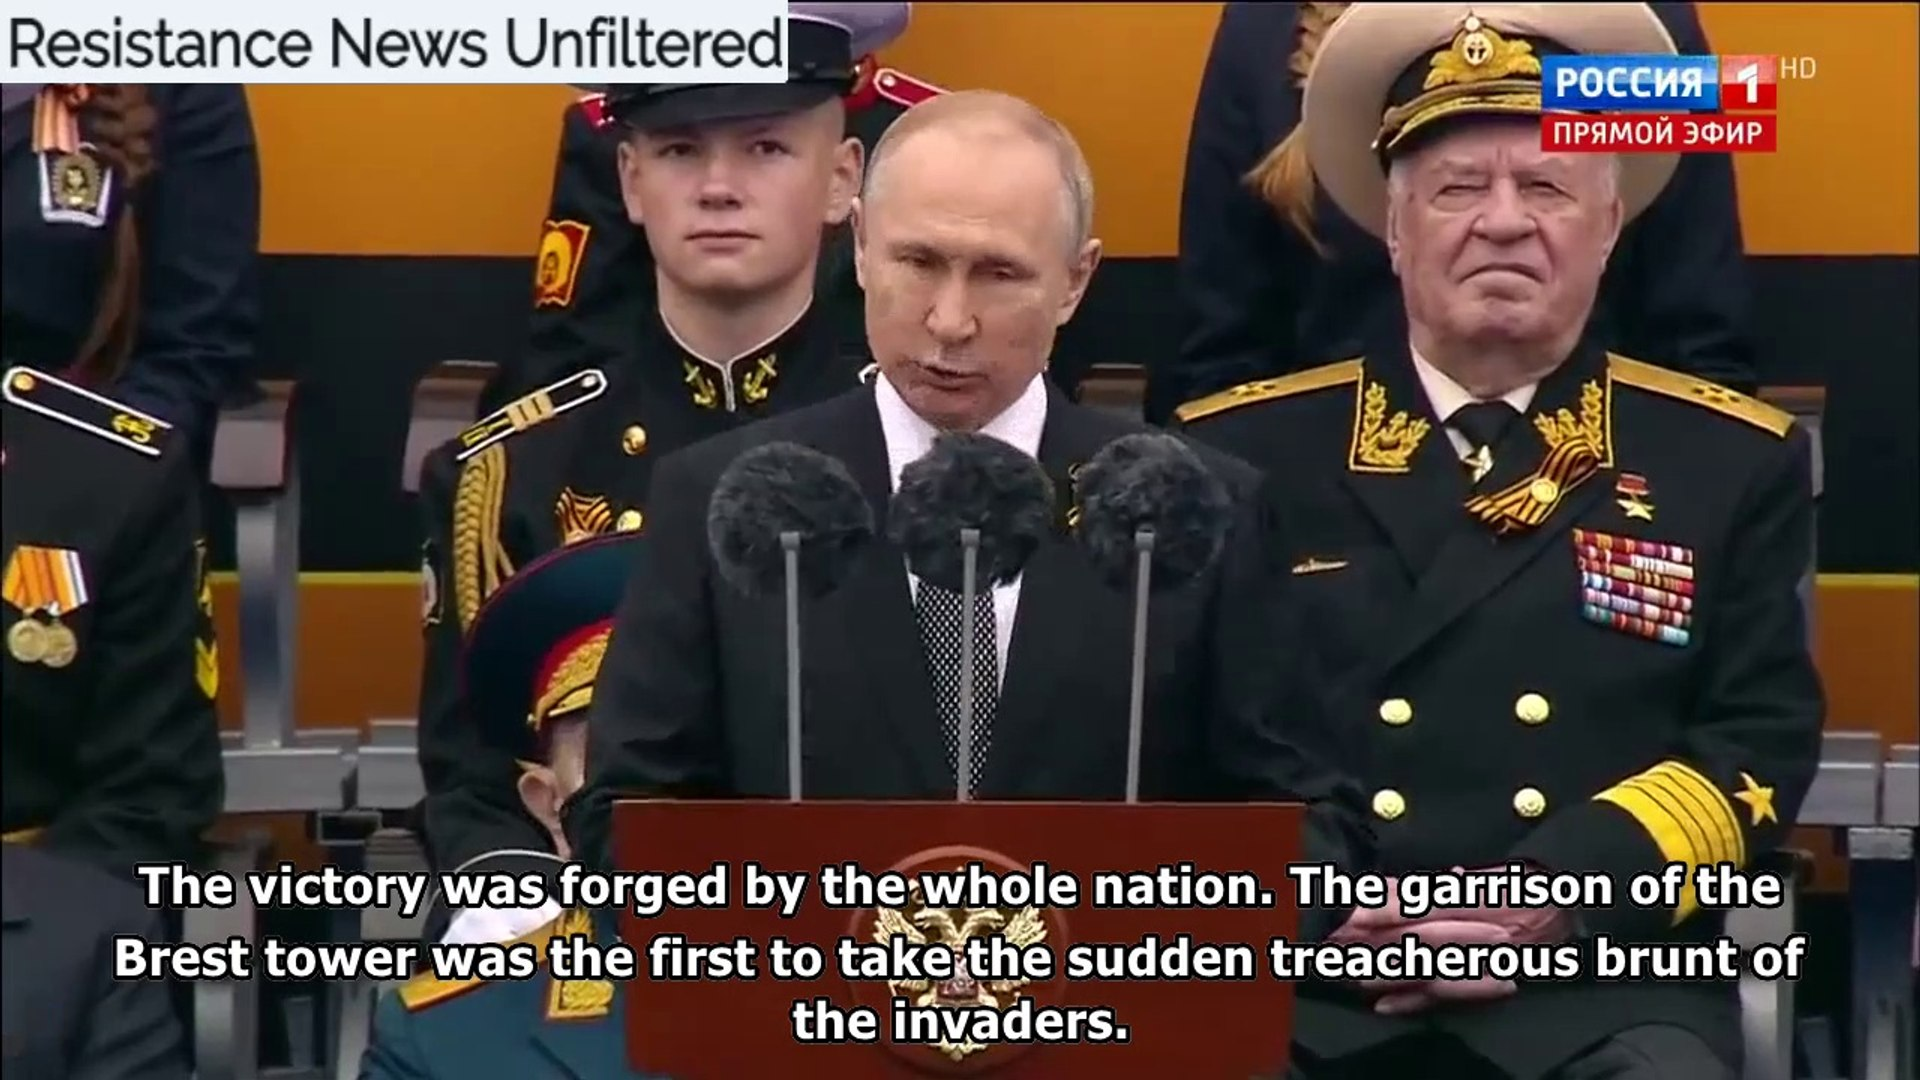 Vladimir Putin's Speech on the 74th anniversary of the defeat of Nazi Germany